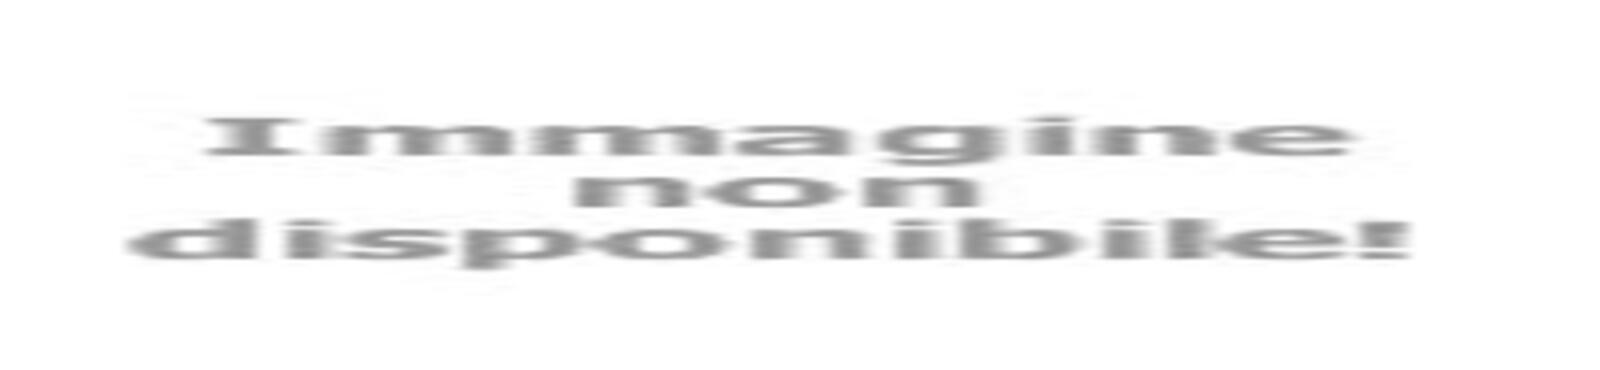 petronianaviaggi it bologna-tour-del-liberty-v321 002